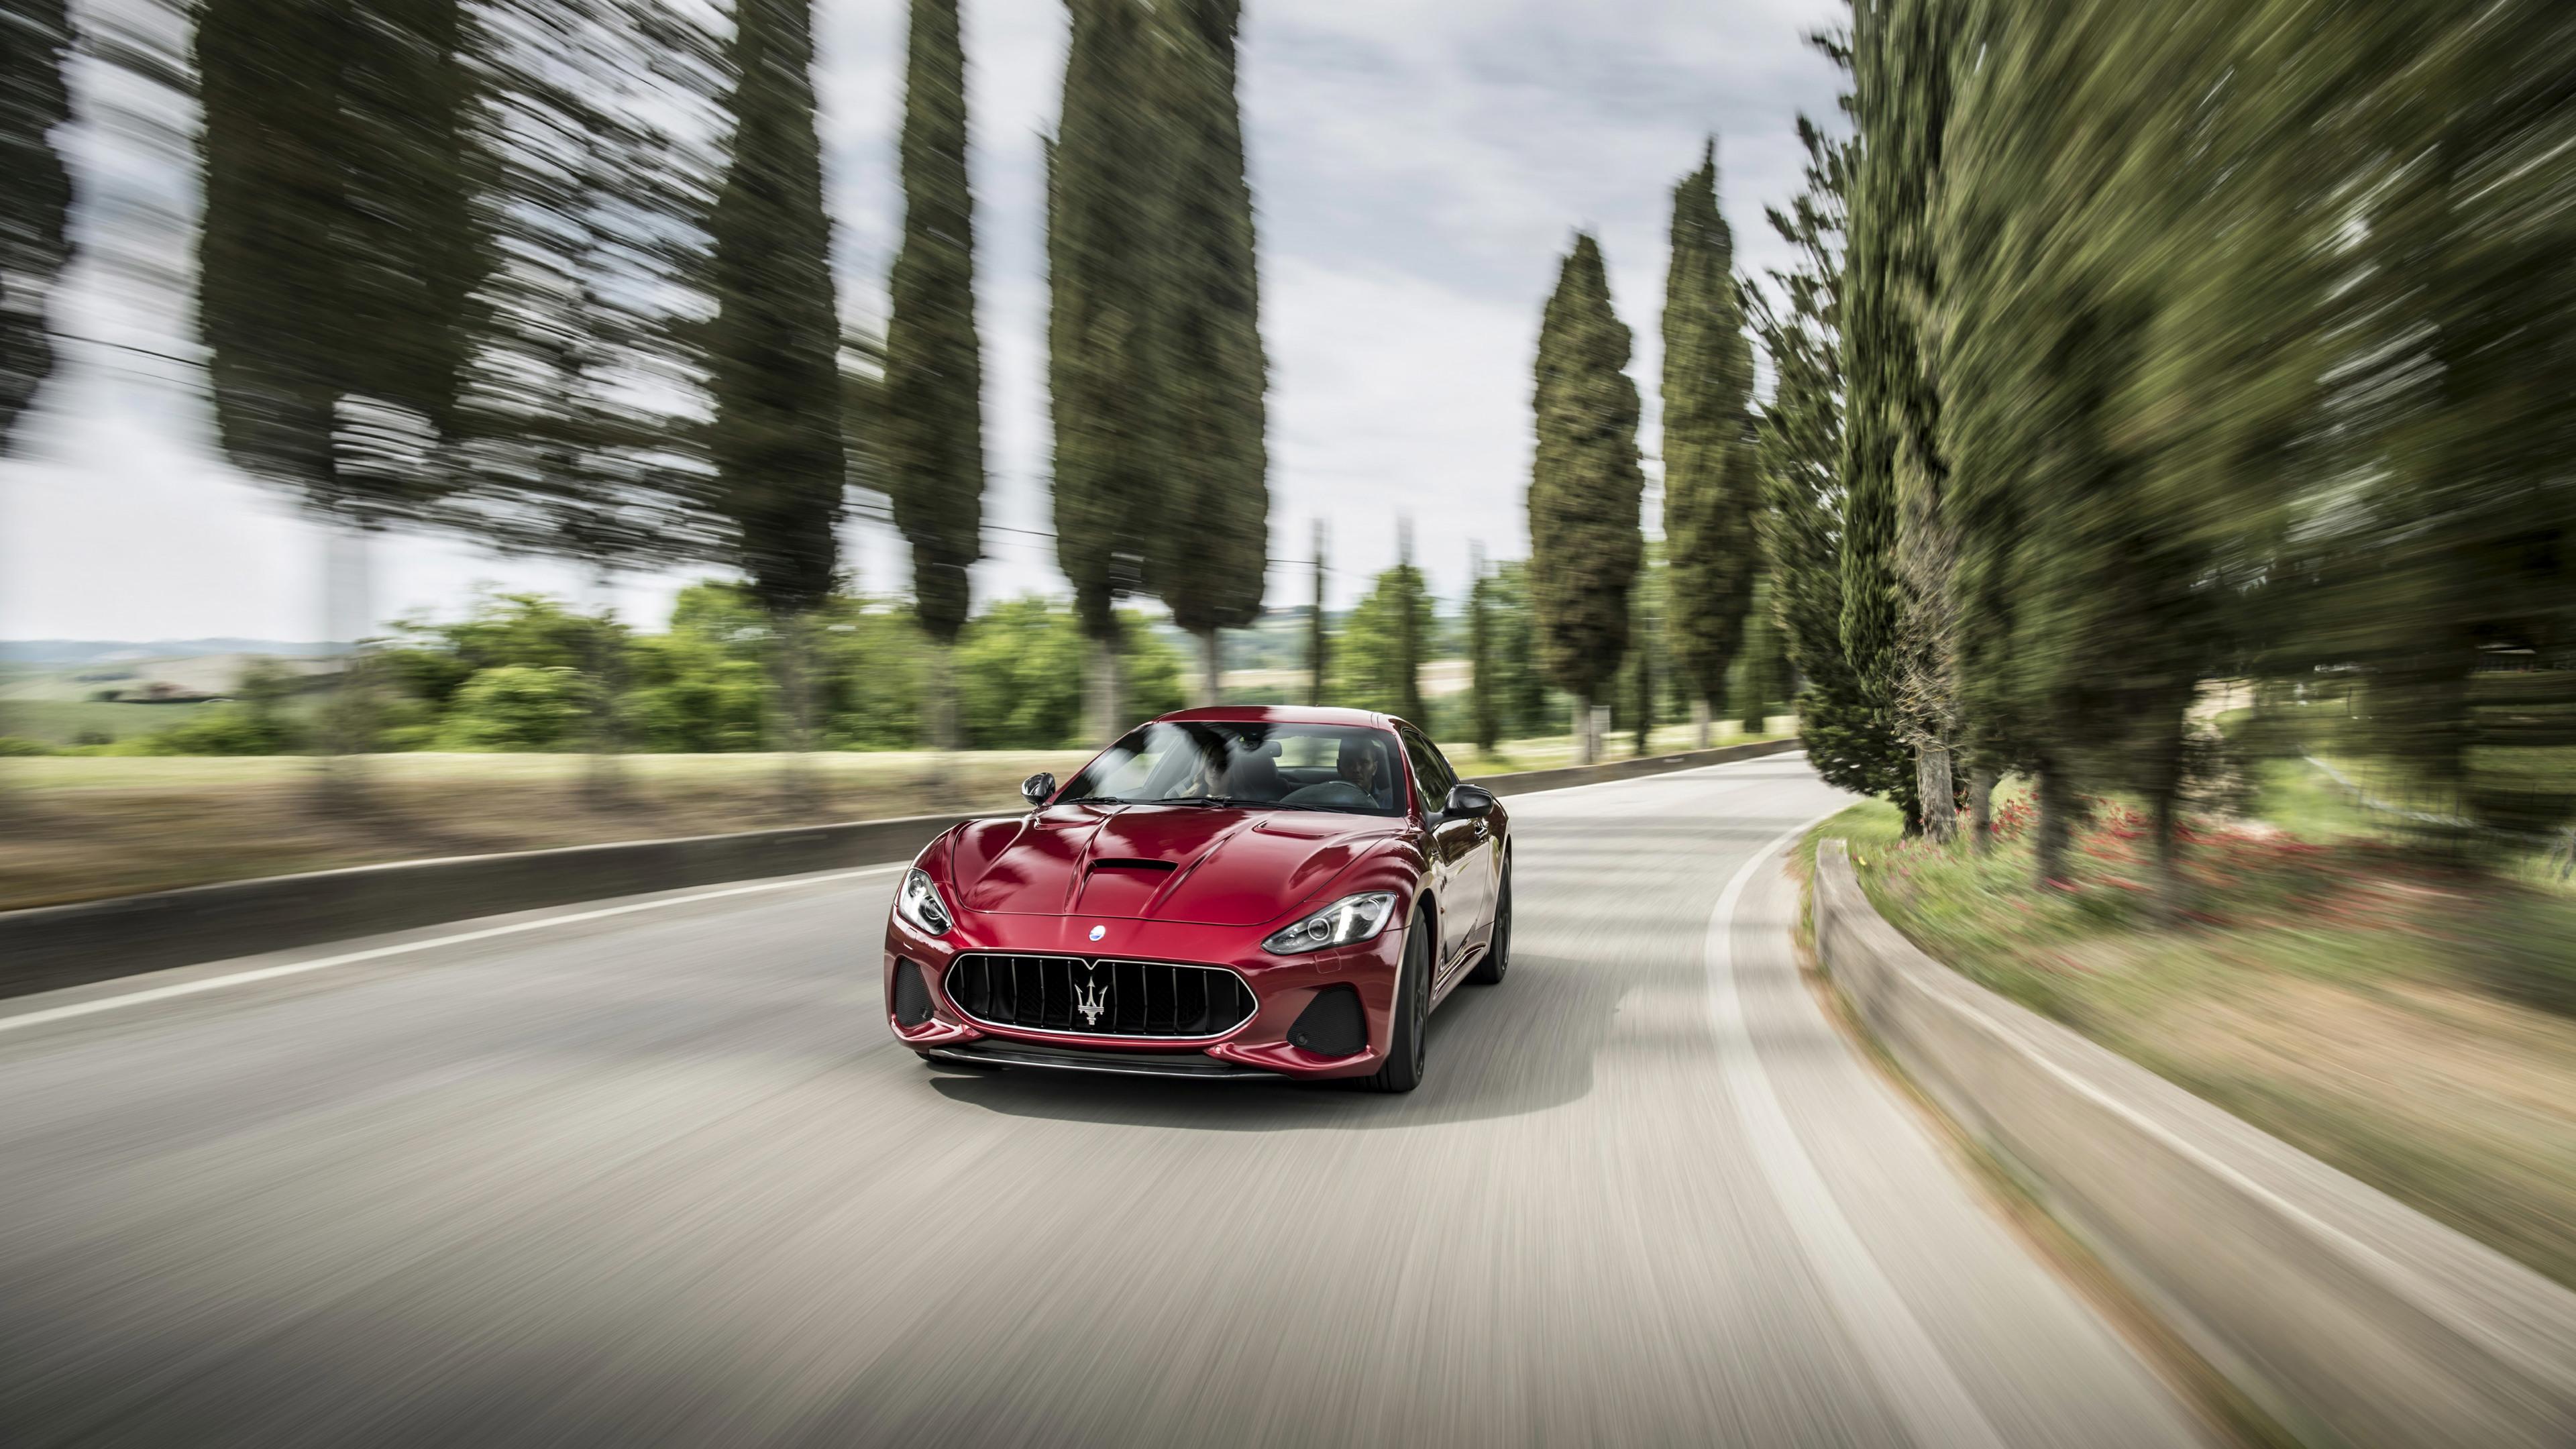 2018 maserati granturismo 1539105545 - 2018 Maserati Granturismo - maserati wallpapers, maserati granturismo wallpapers, hd-wallpapers, cars wallpapers, 4k-wallpapers, 2018 cars wallpapers